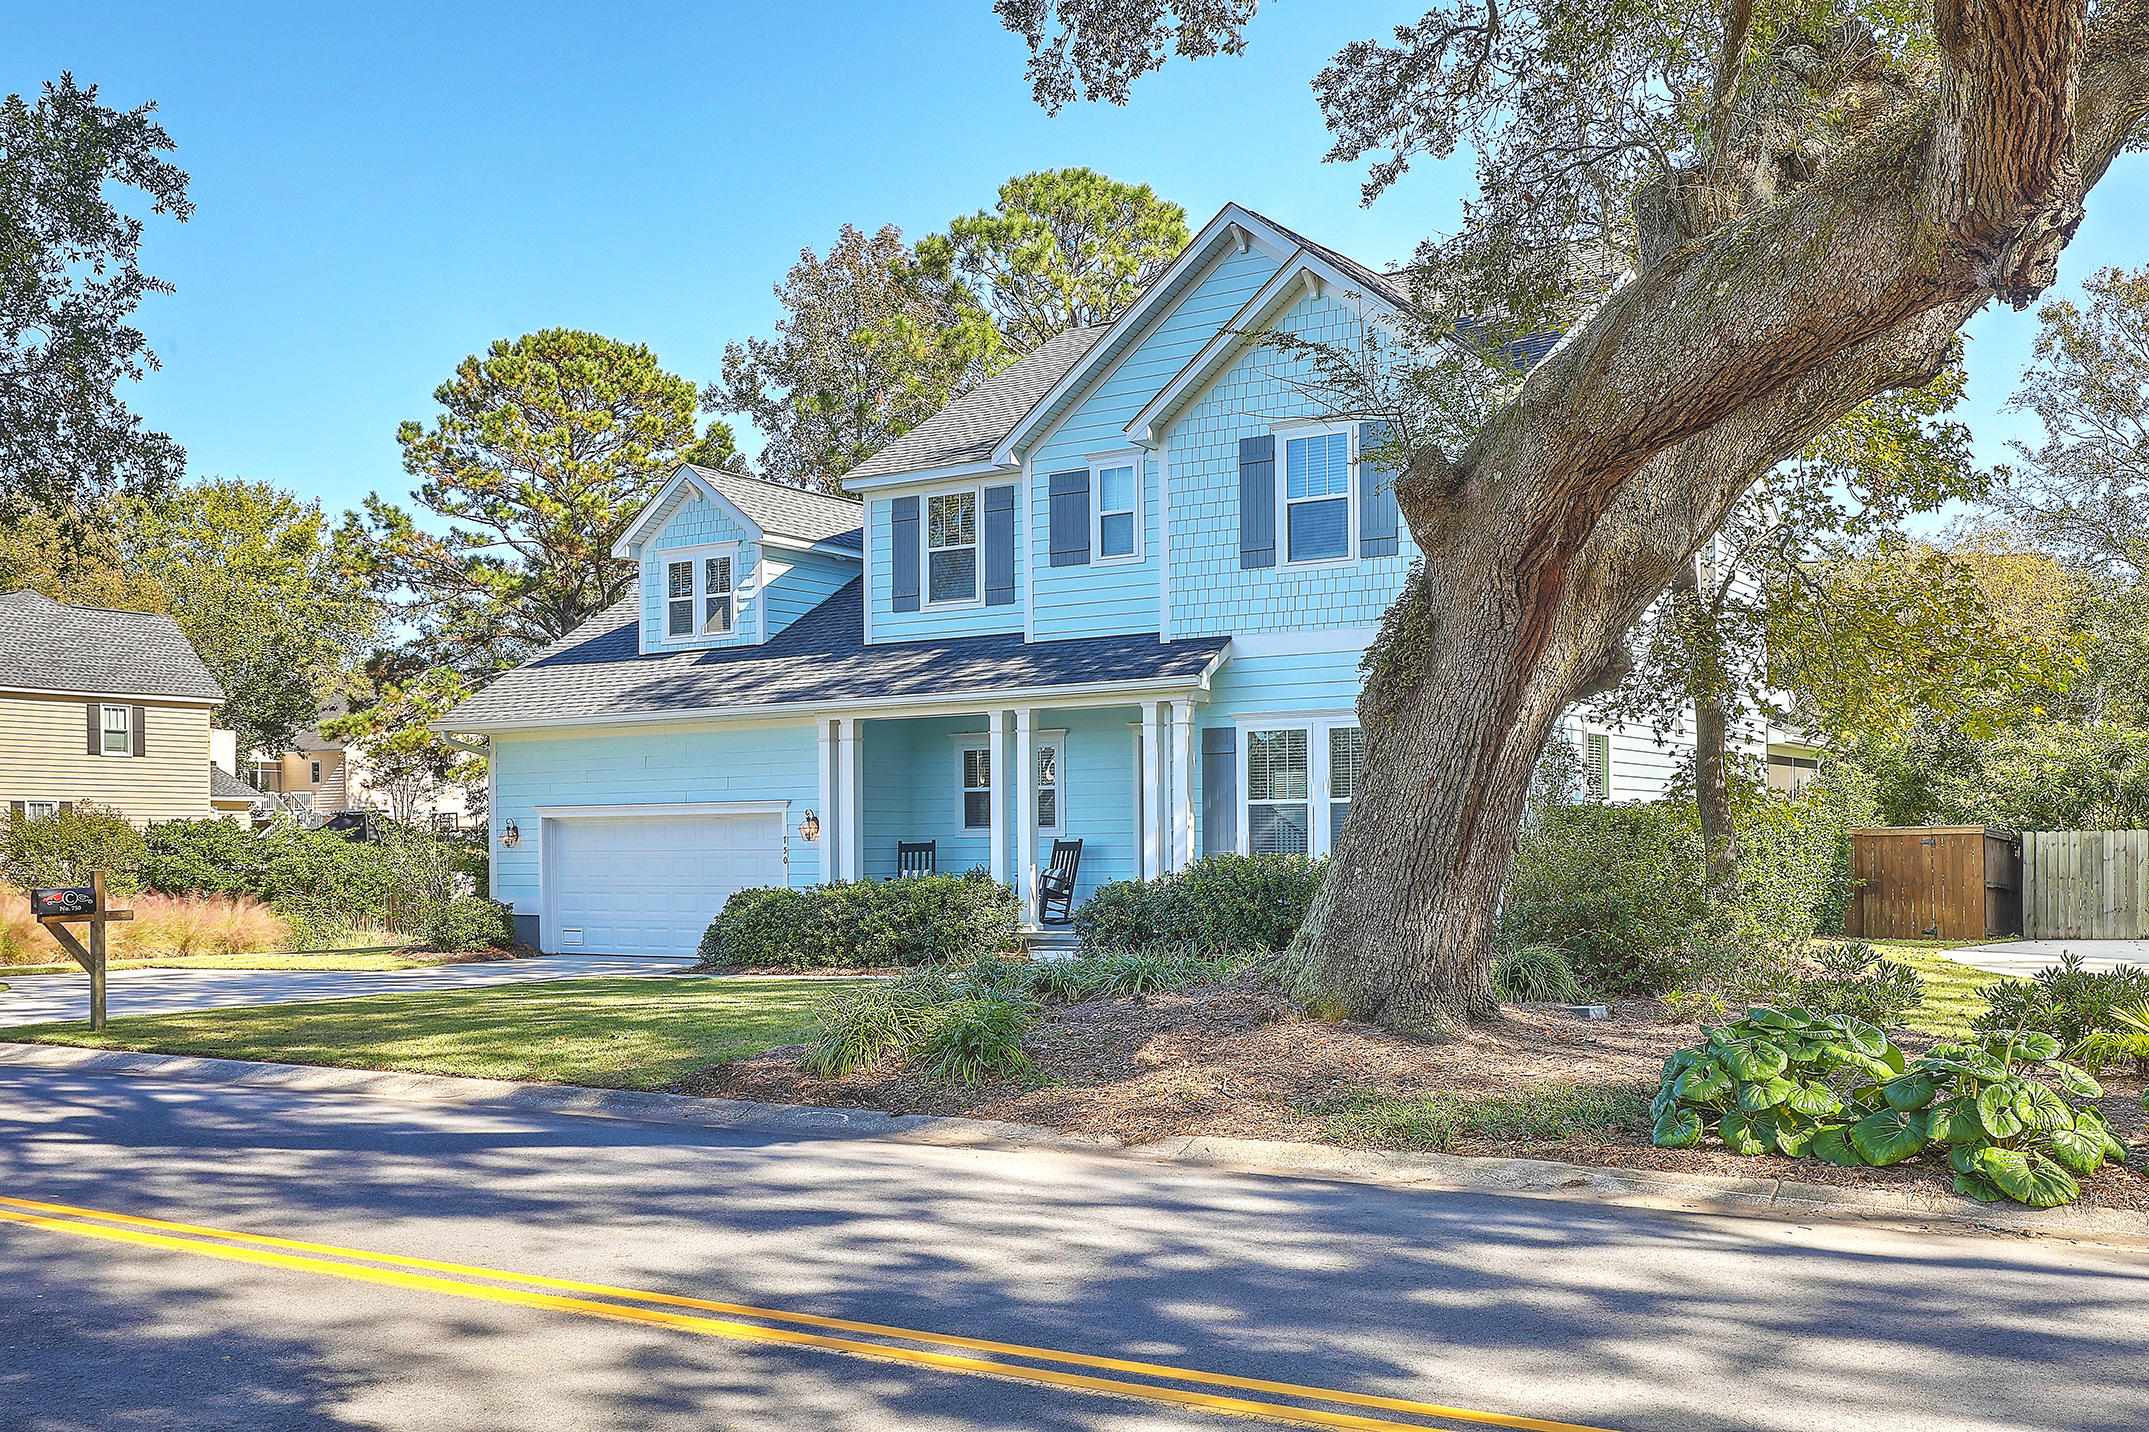 Stiles Point Plantation Homes For Sale - 750 Old Plantation, Charleston, SC - 21